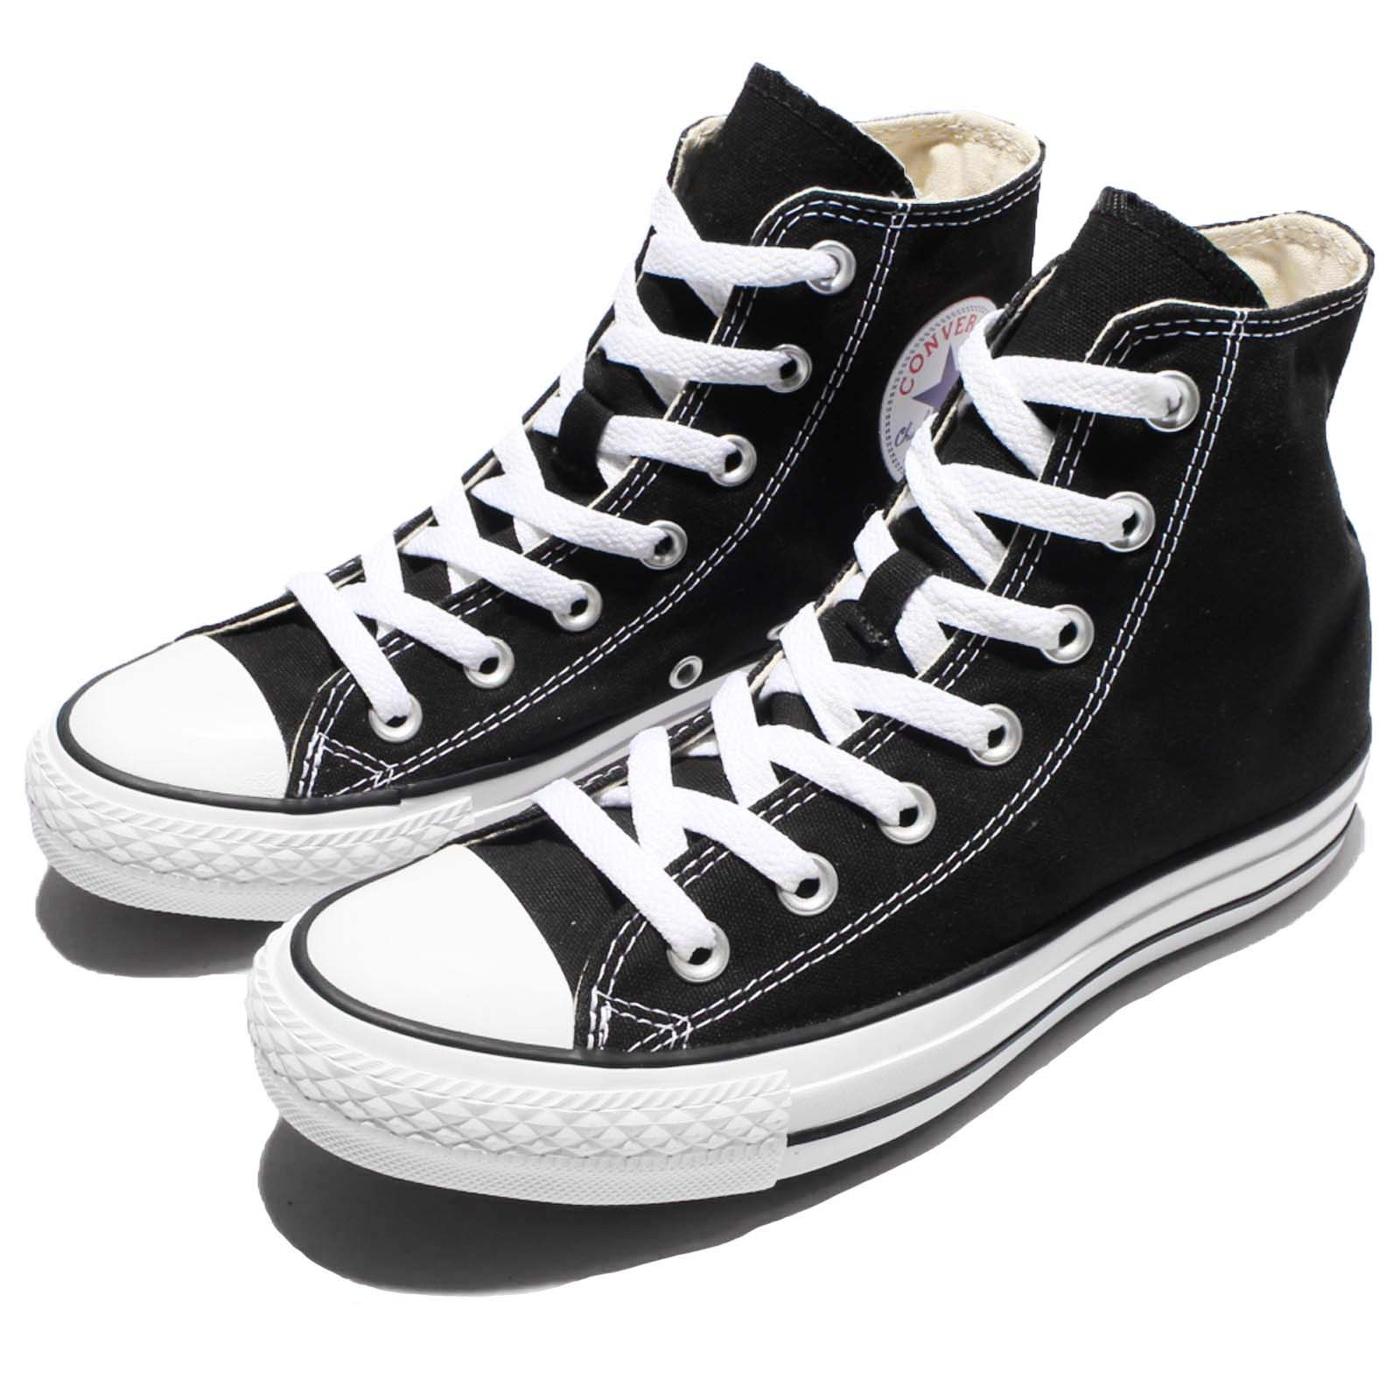 Converse Chuck Taylor All Star黑白基本款帆布鞋高筒基本款男鞋女鞋PUMP306